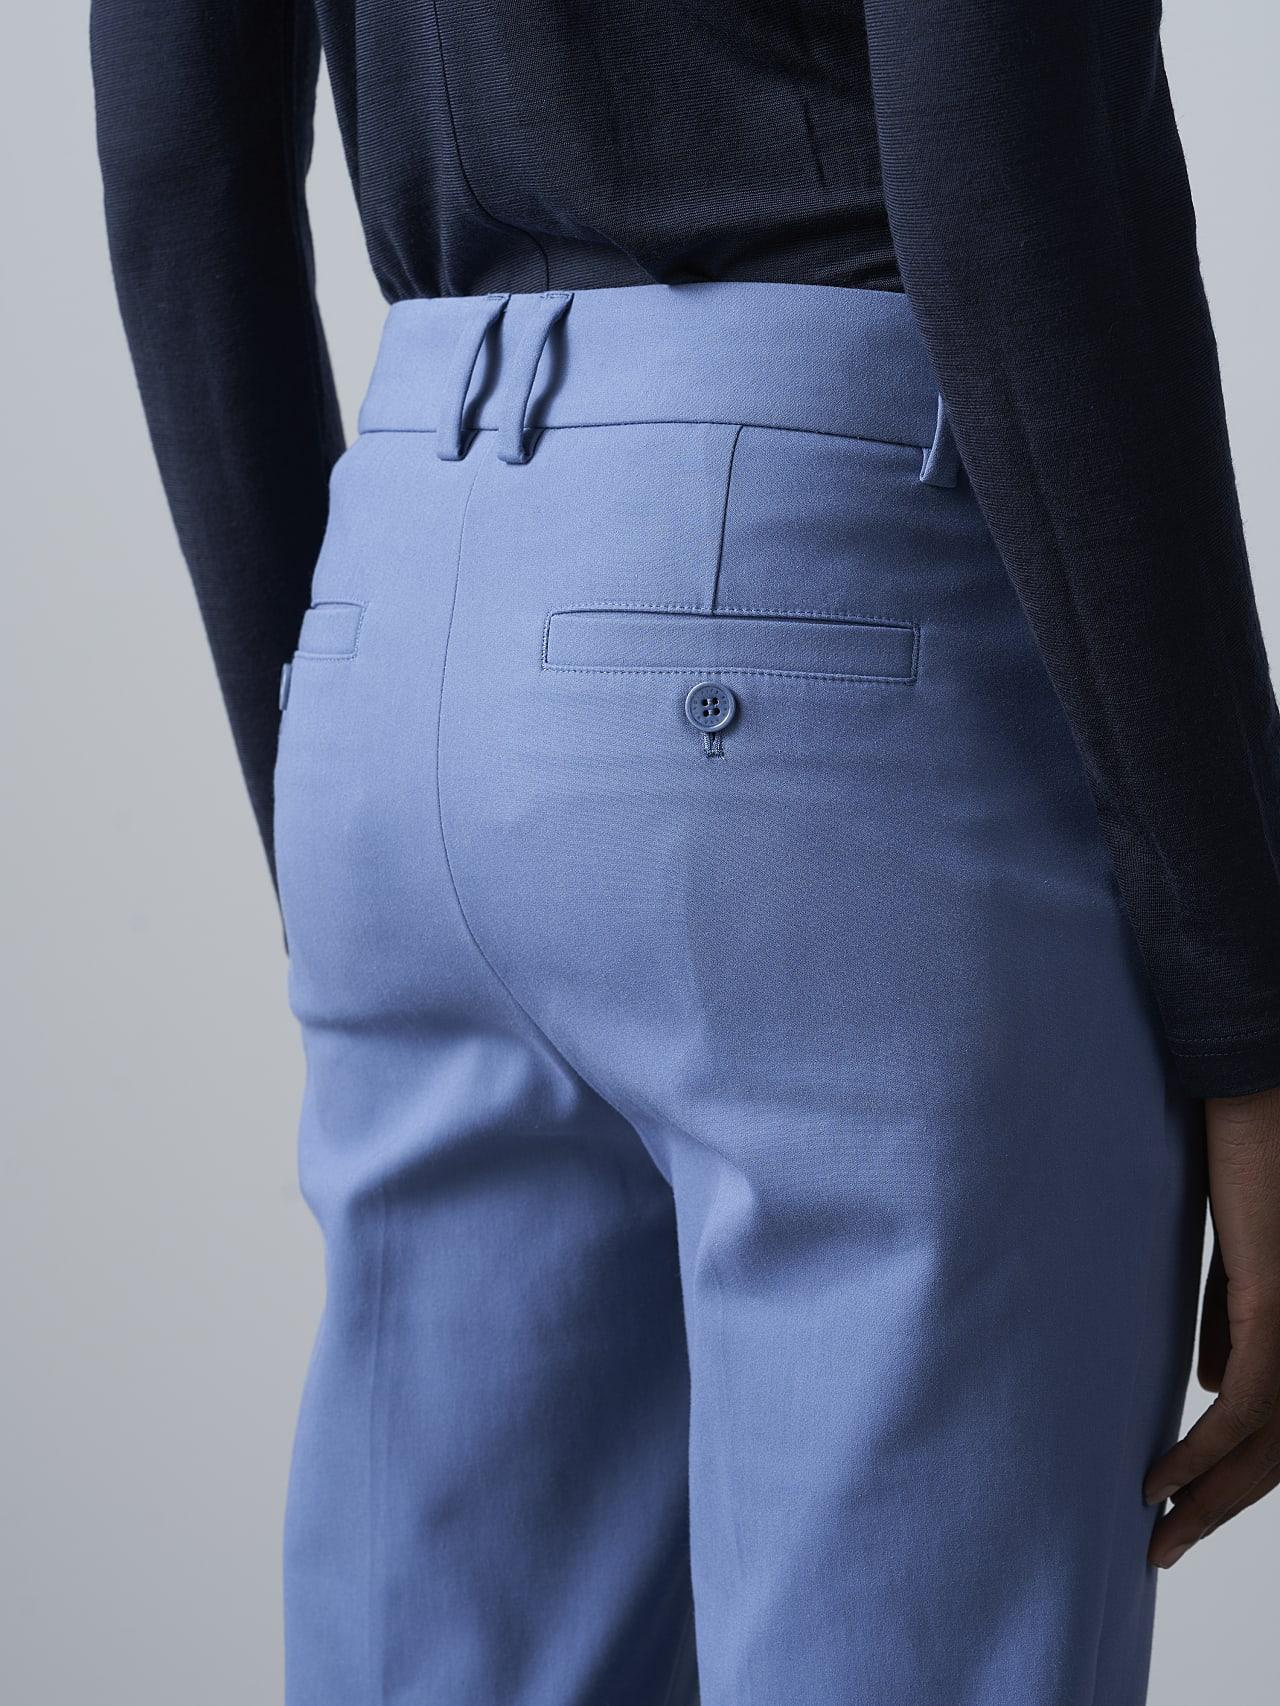 PERTI V1.Y5.02 Slim-Fit Tapered Pants light blue Right Alpha Tauri